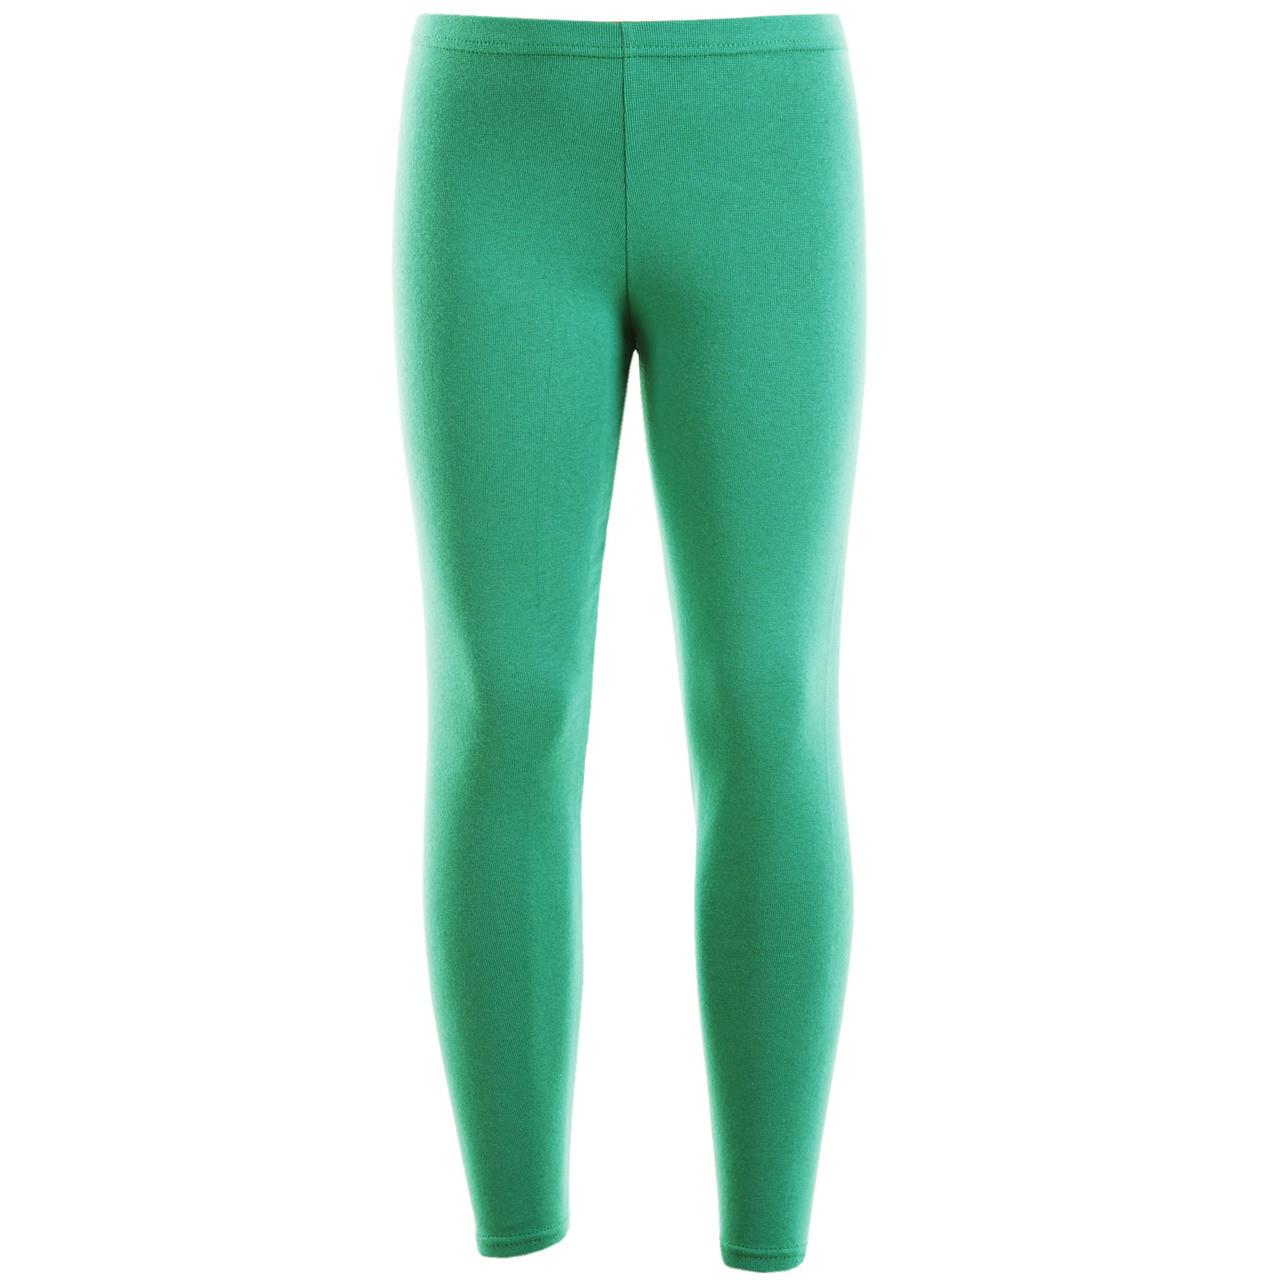 f95670523ed59 Girls Plain Cotton Leggings Tights School wear   Shop Online At ...